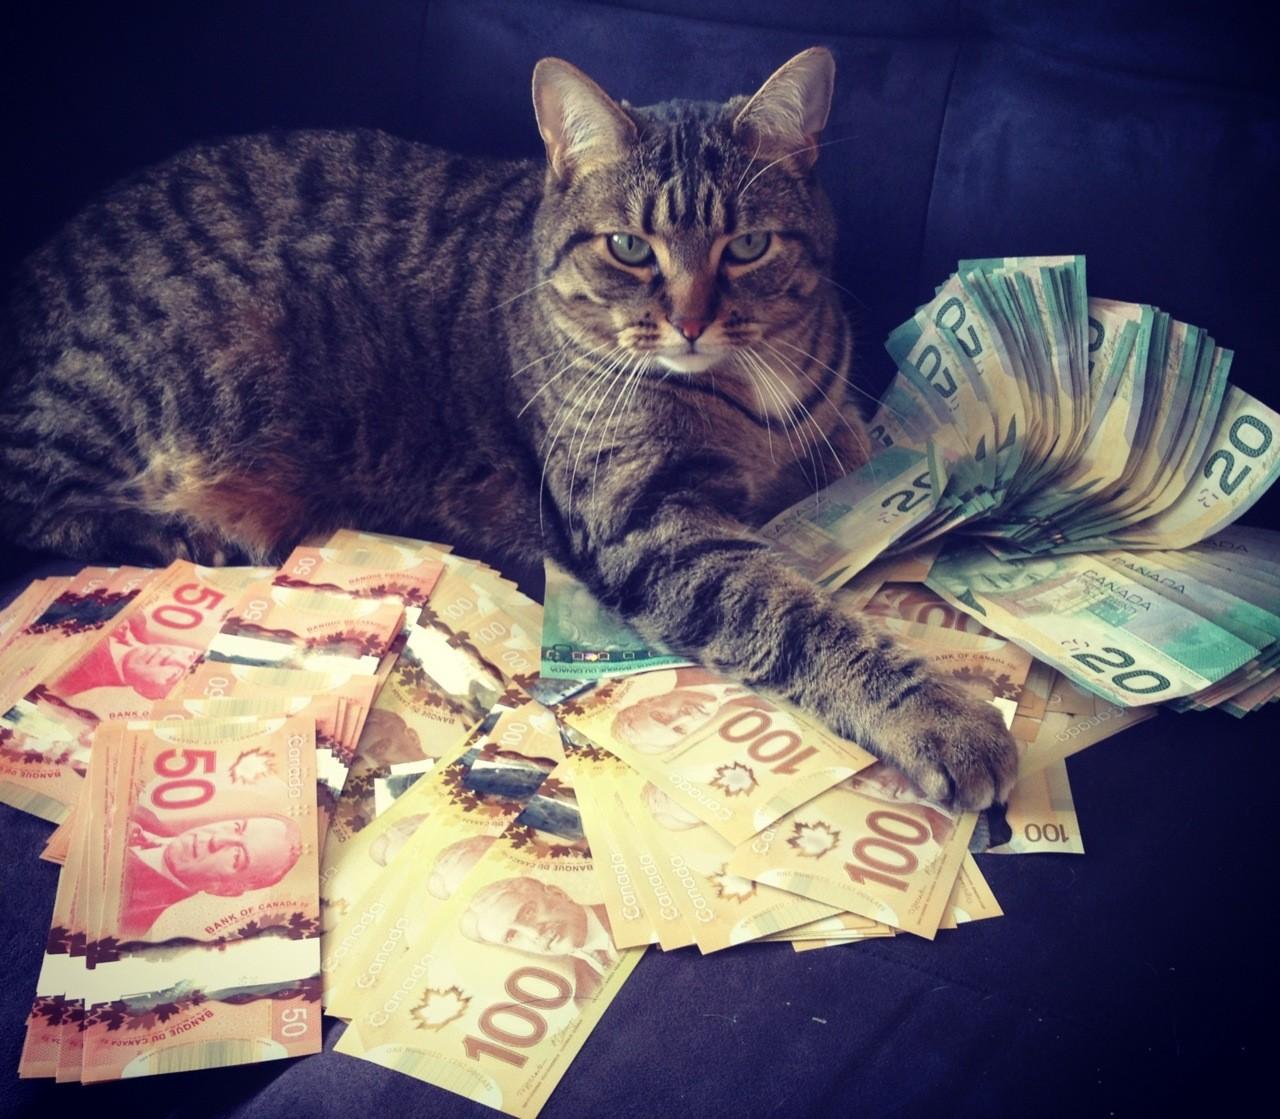 ВИталии кот получил внаследство 30 000 евро